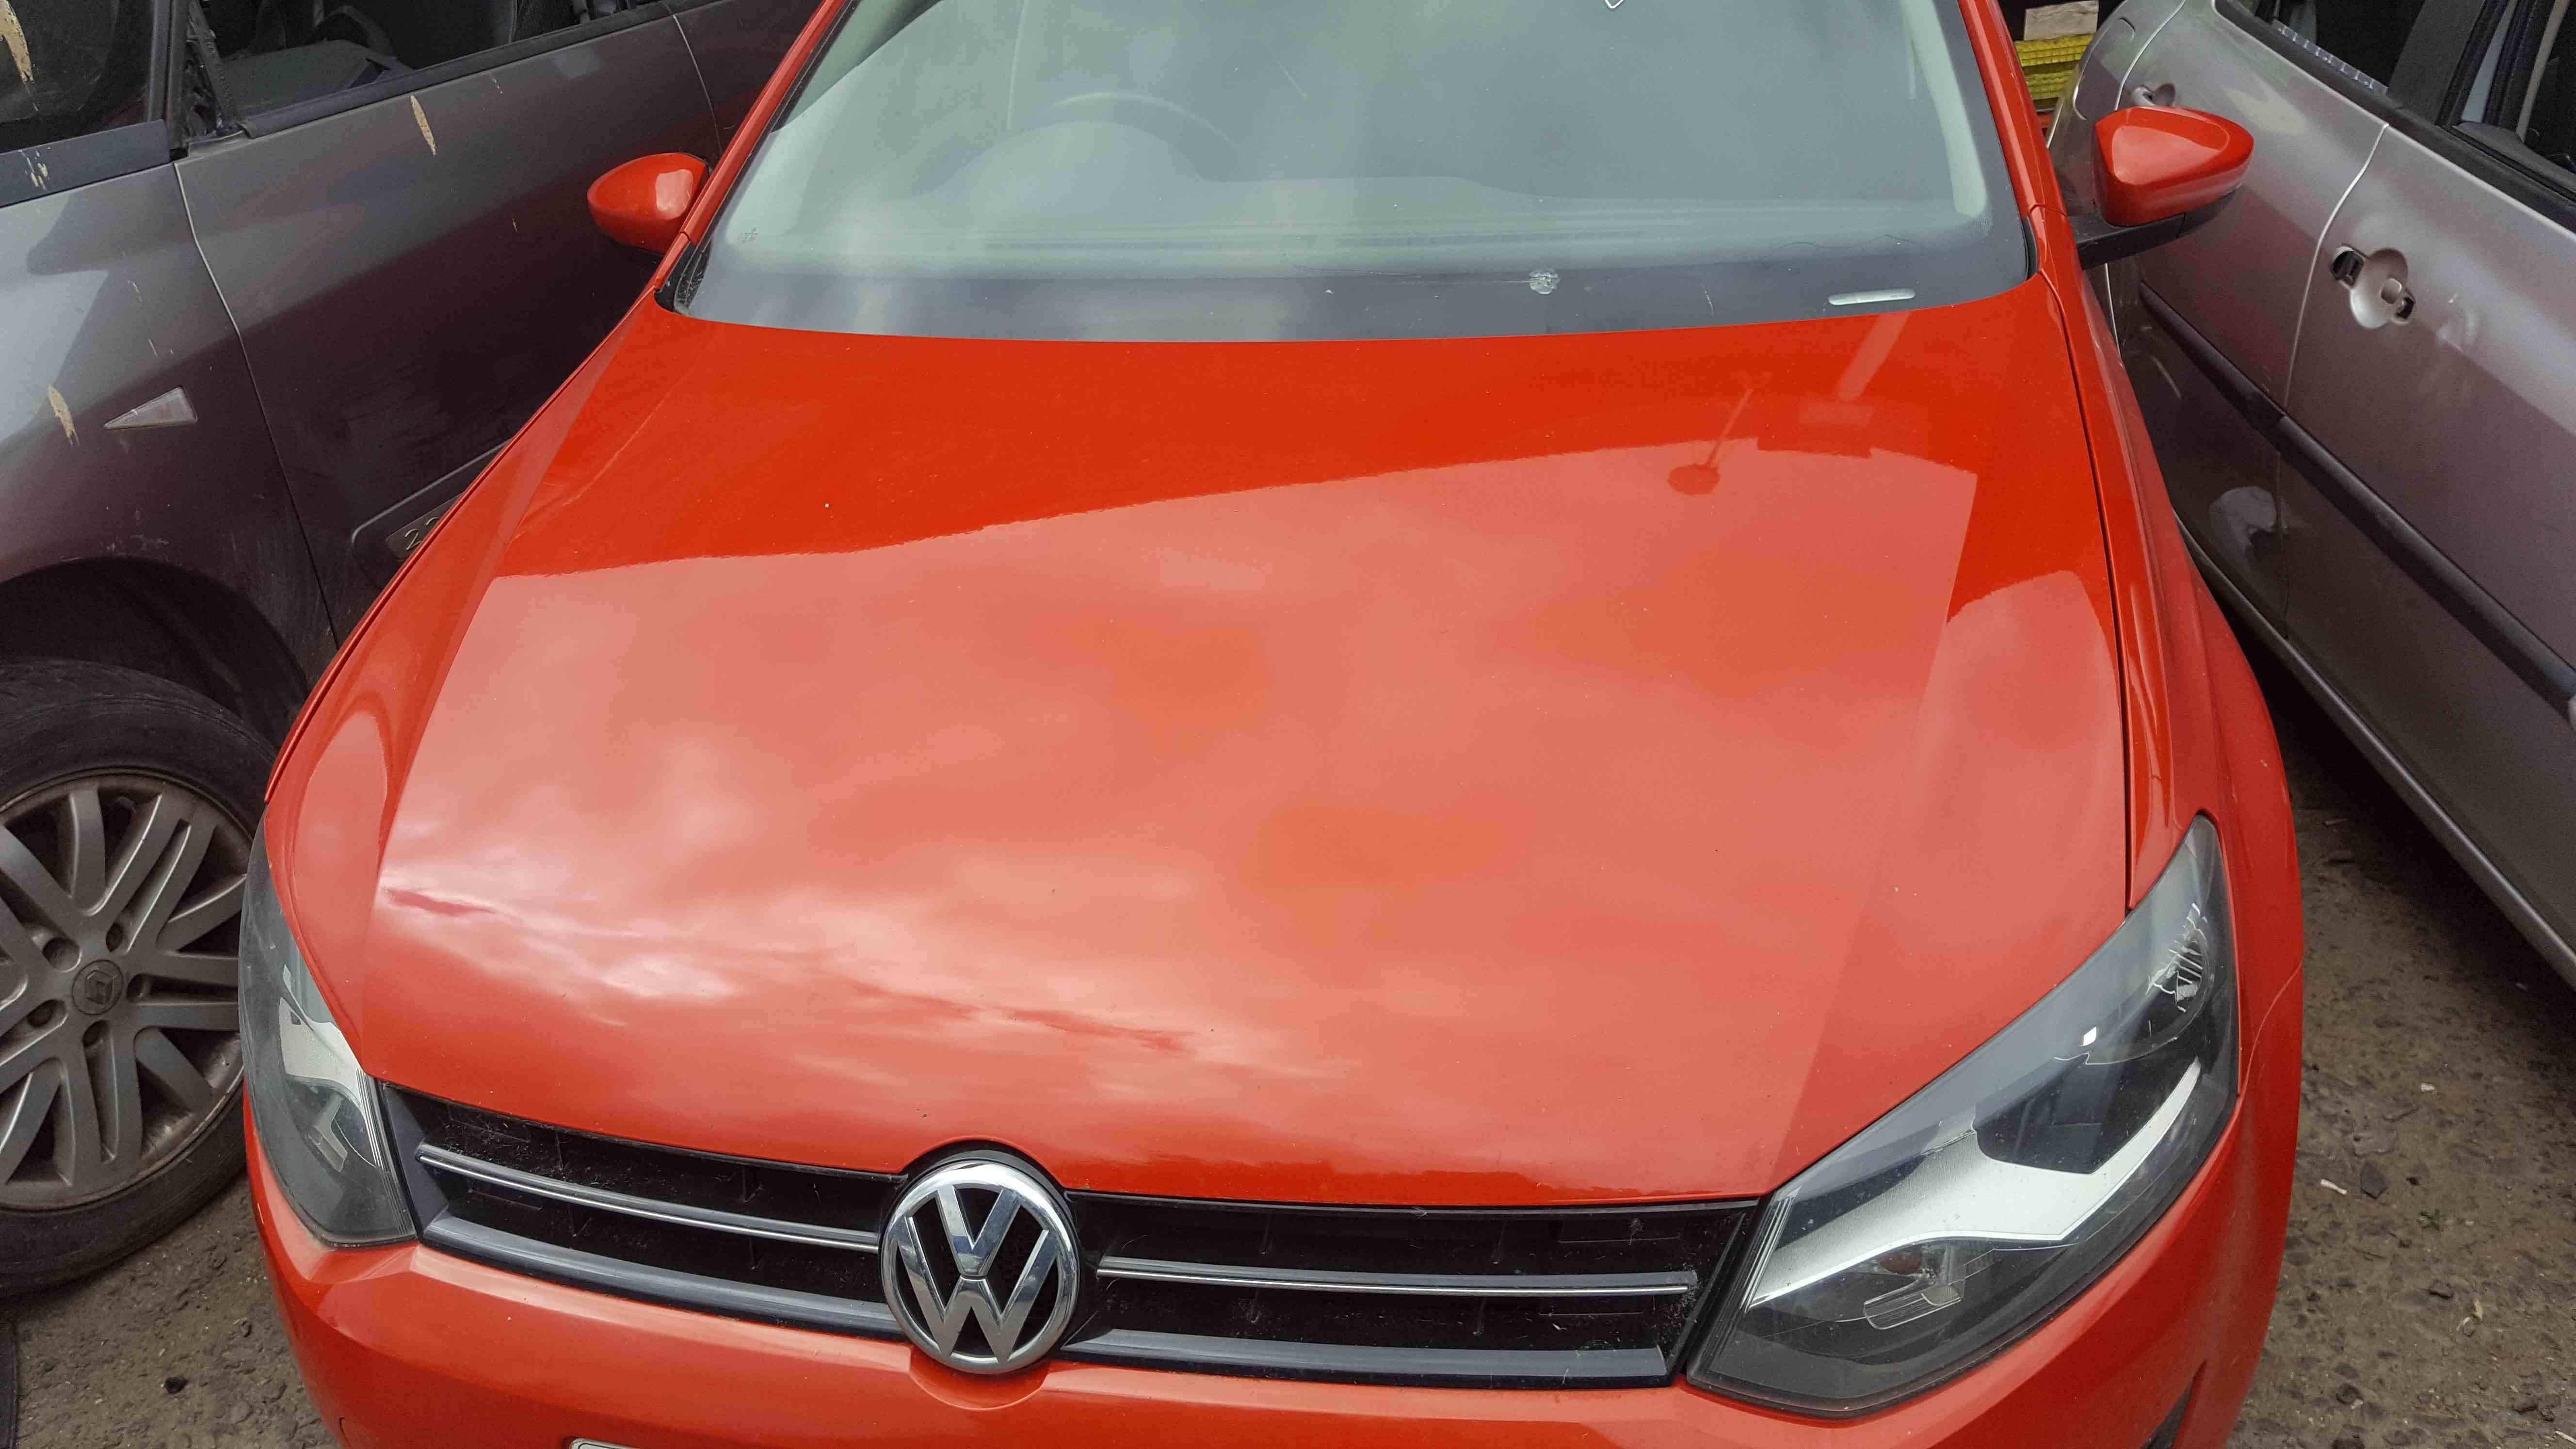 Volkswagen Polo 6R 2009-2014 Front Bonnet Orange LD2Z